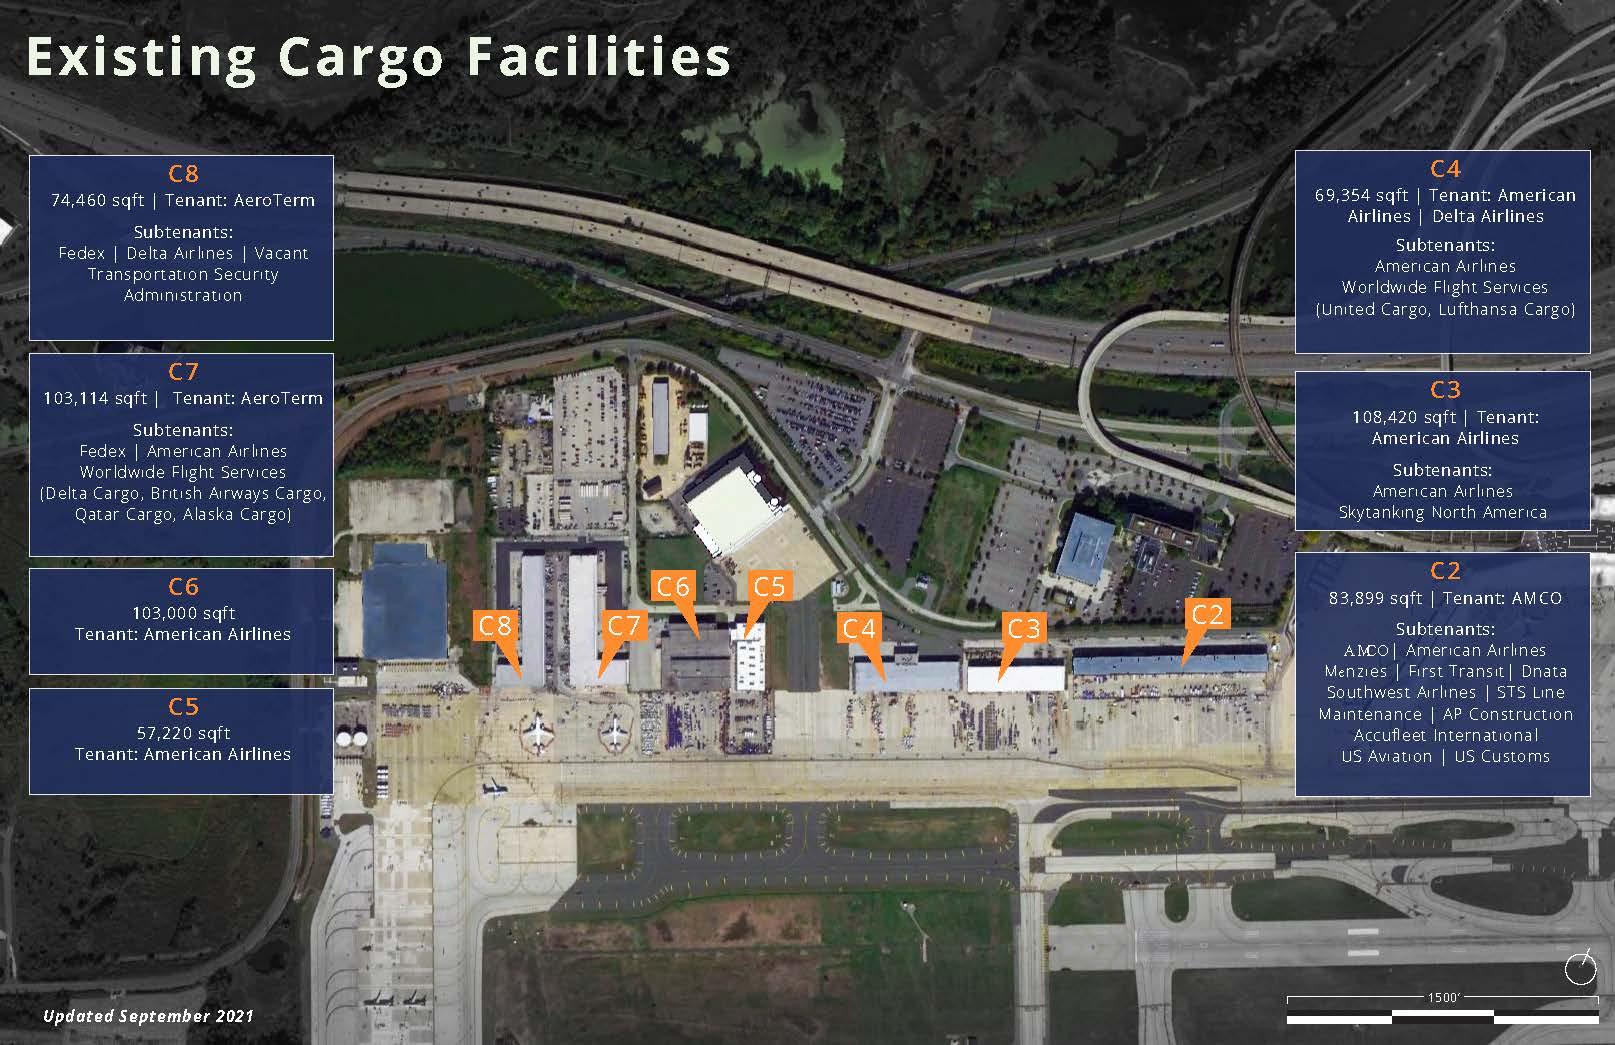 Existing Cargo